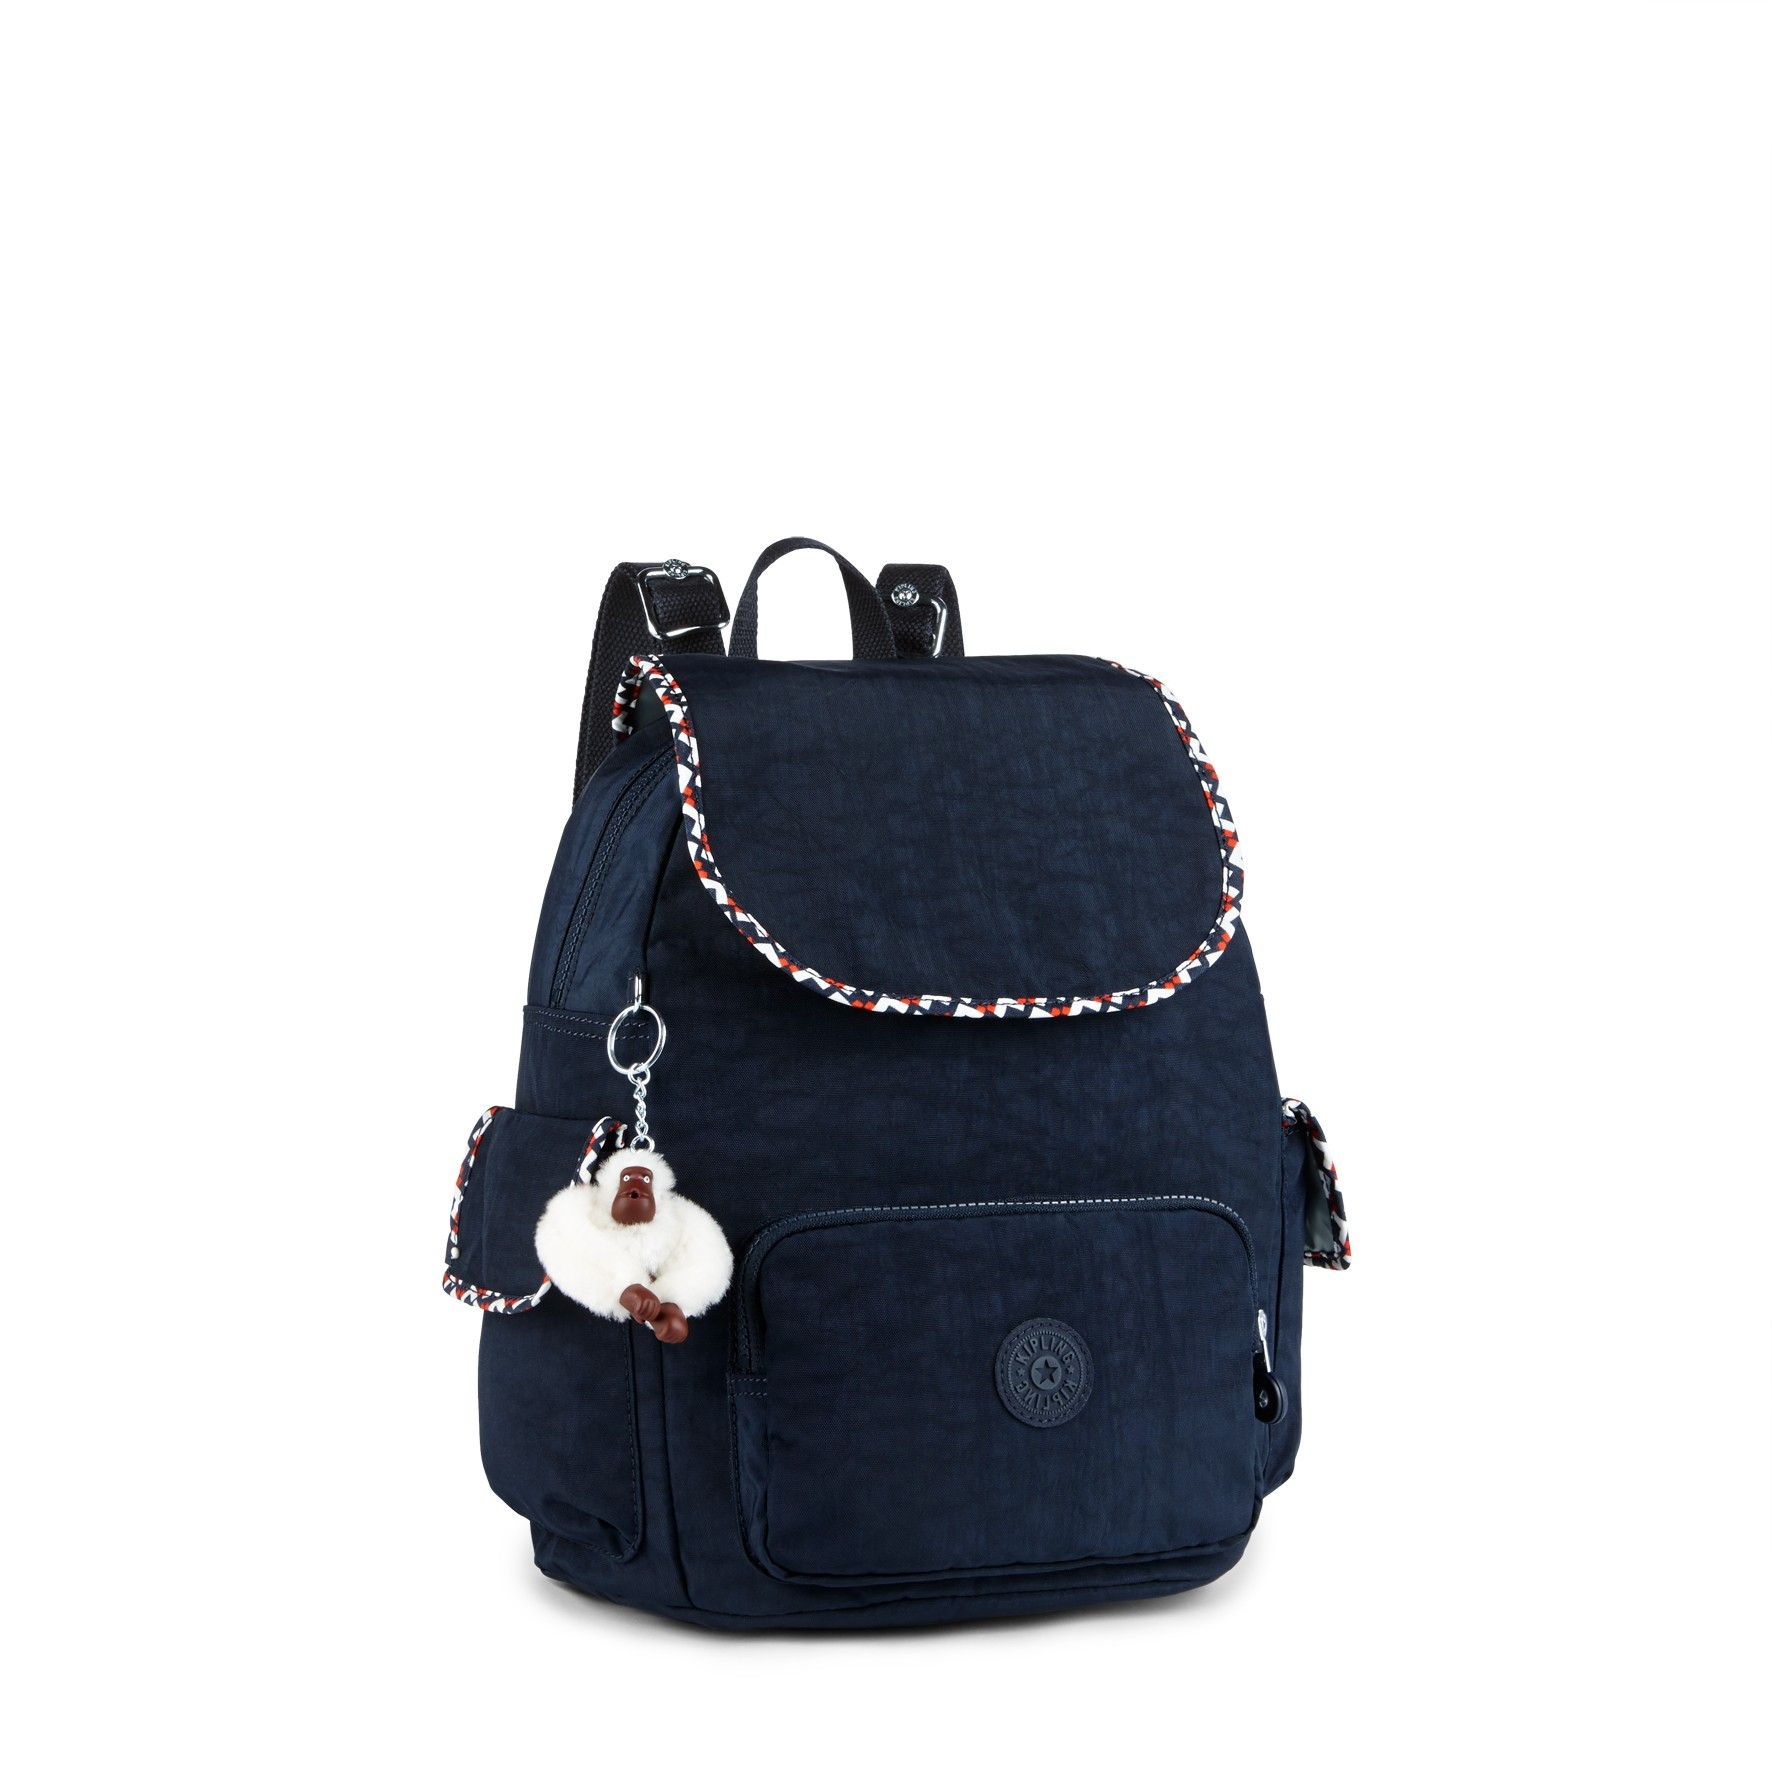 f33c2d83d Retail exclusive Backpack - Kipling Spring 15 Mochila Kipling, Mini  Mochila, Bolsa Mochila,